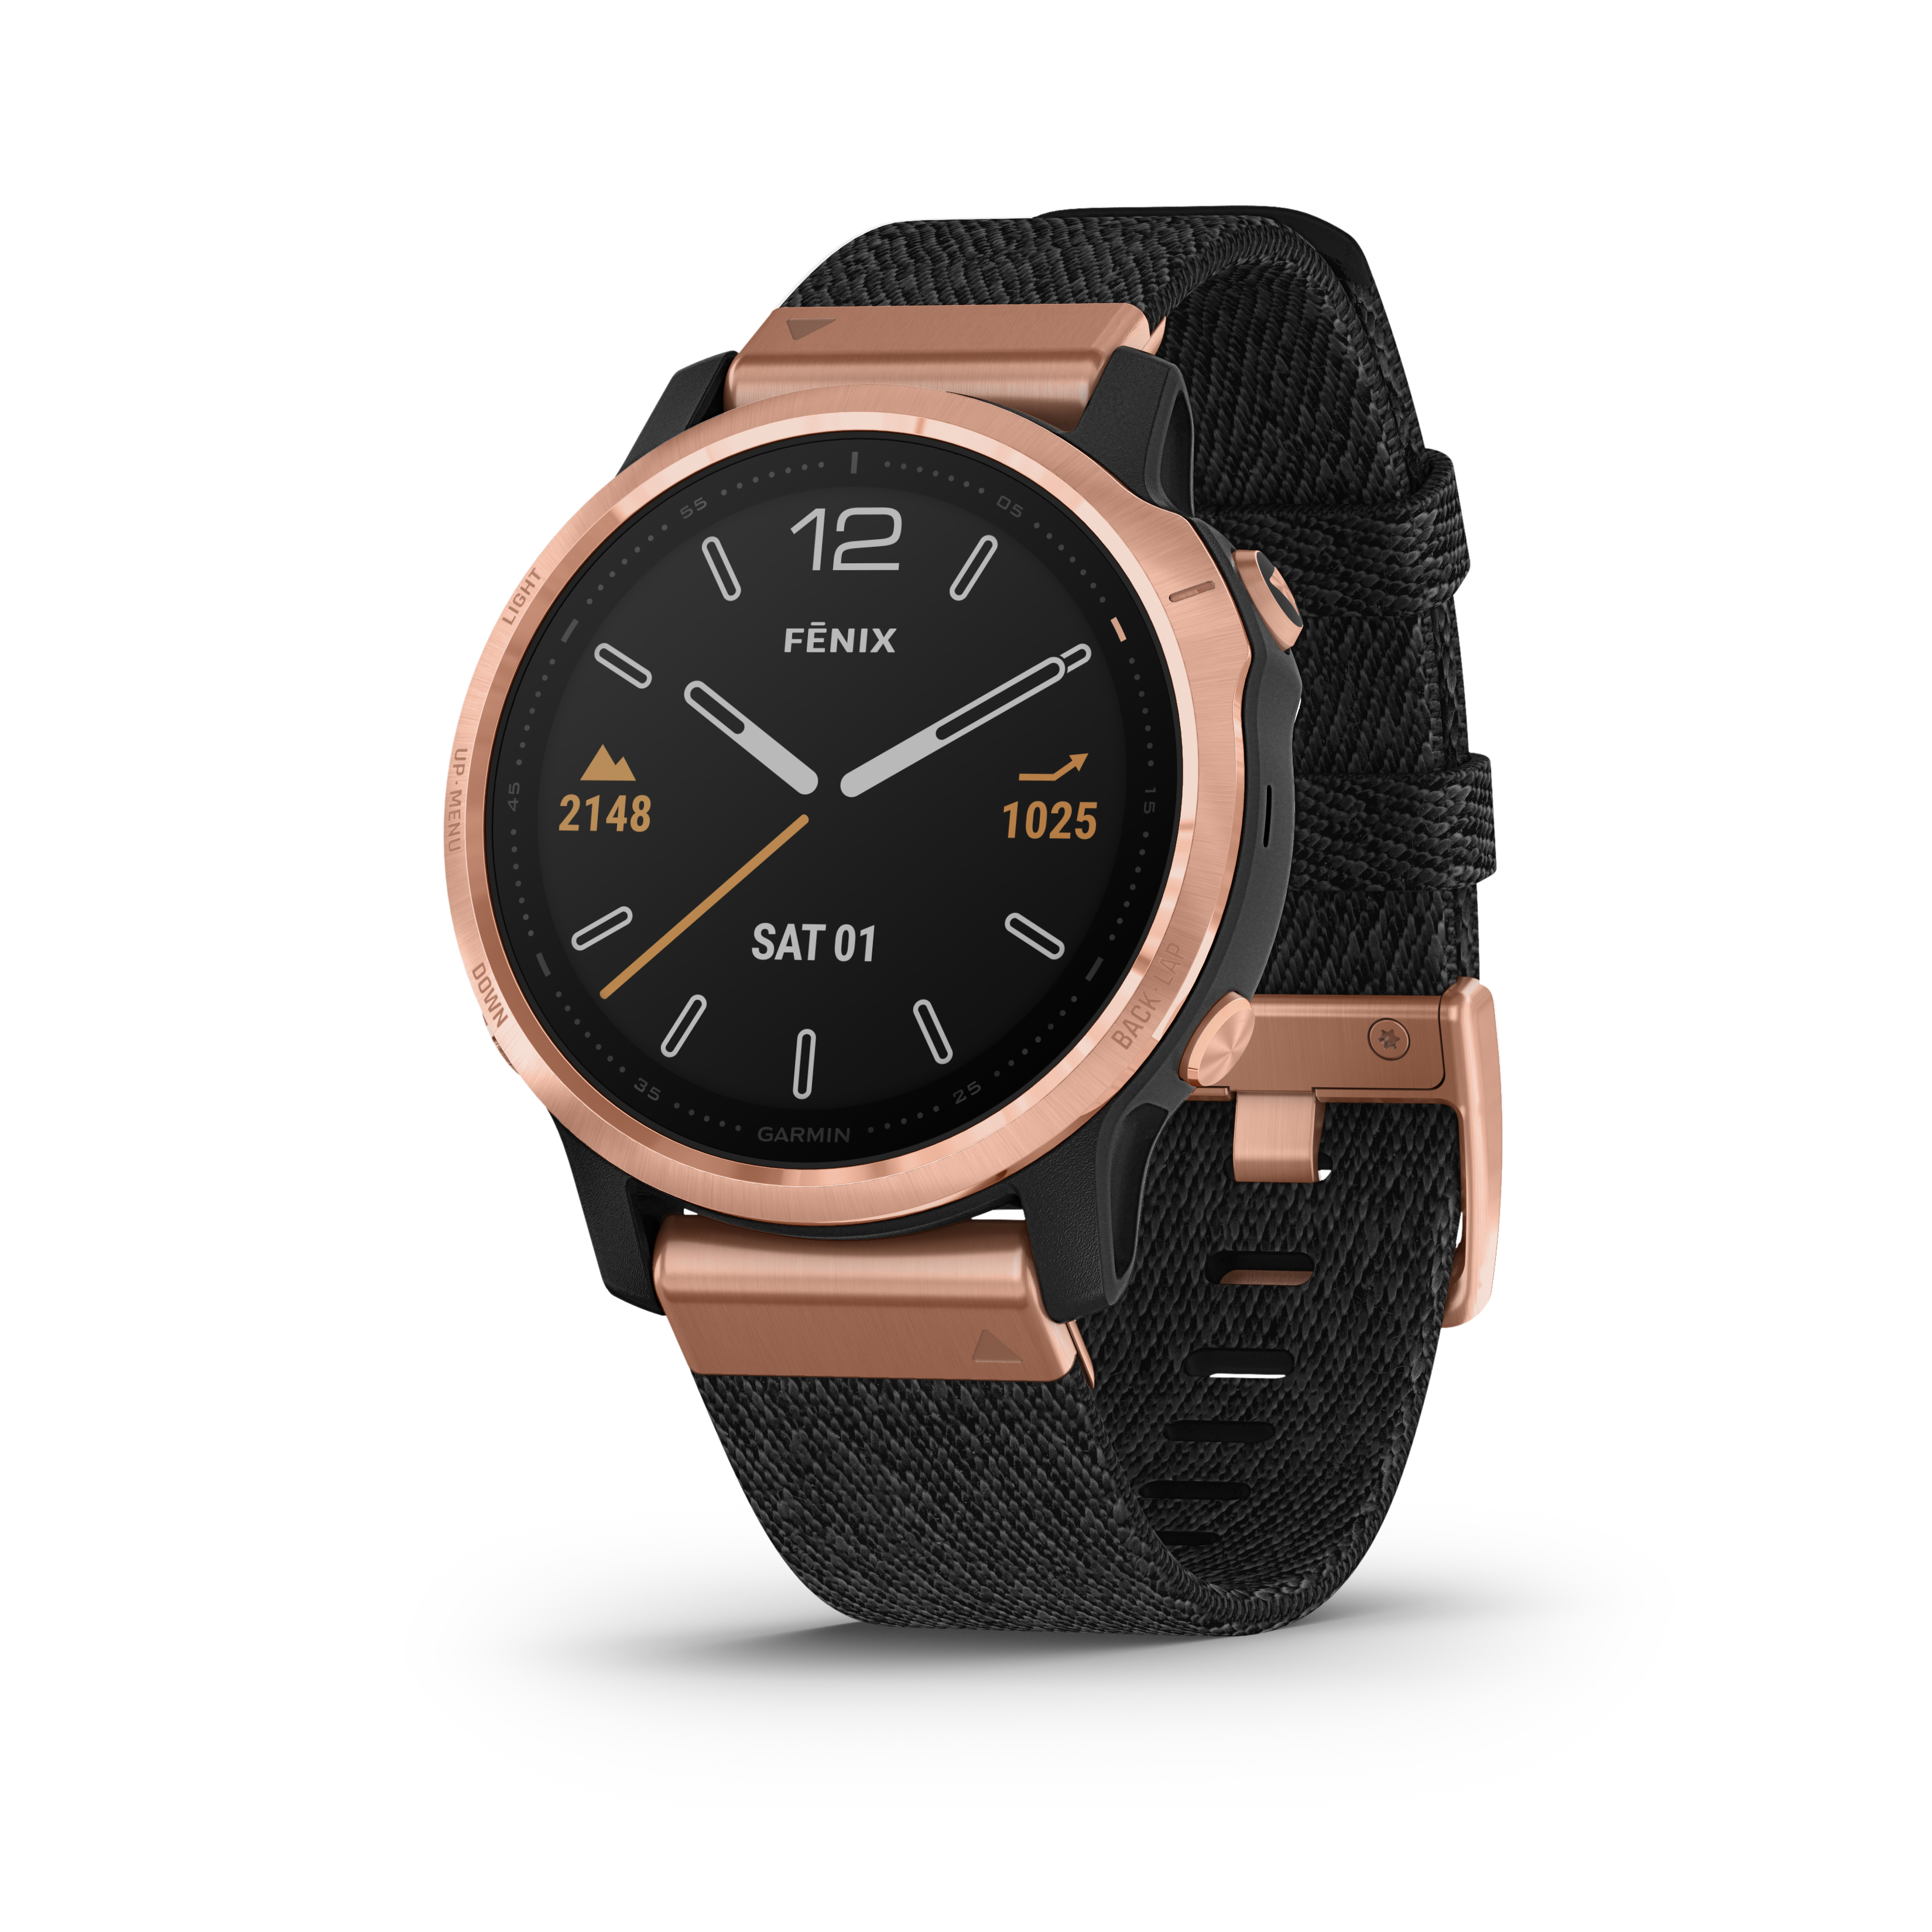 Garmin Fēnix 6S Pro Sapphire, Black/Rose-Gold